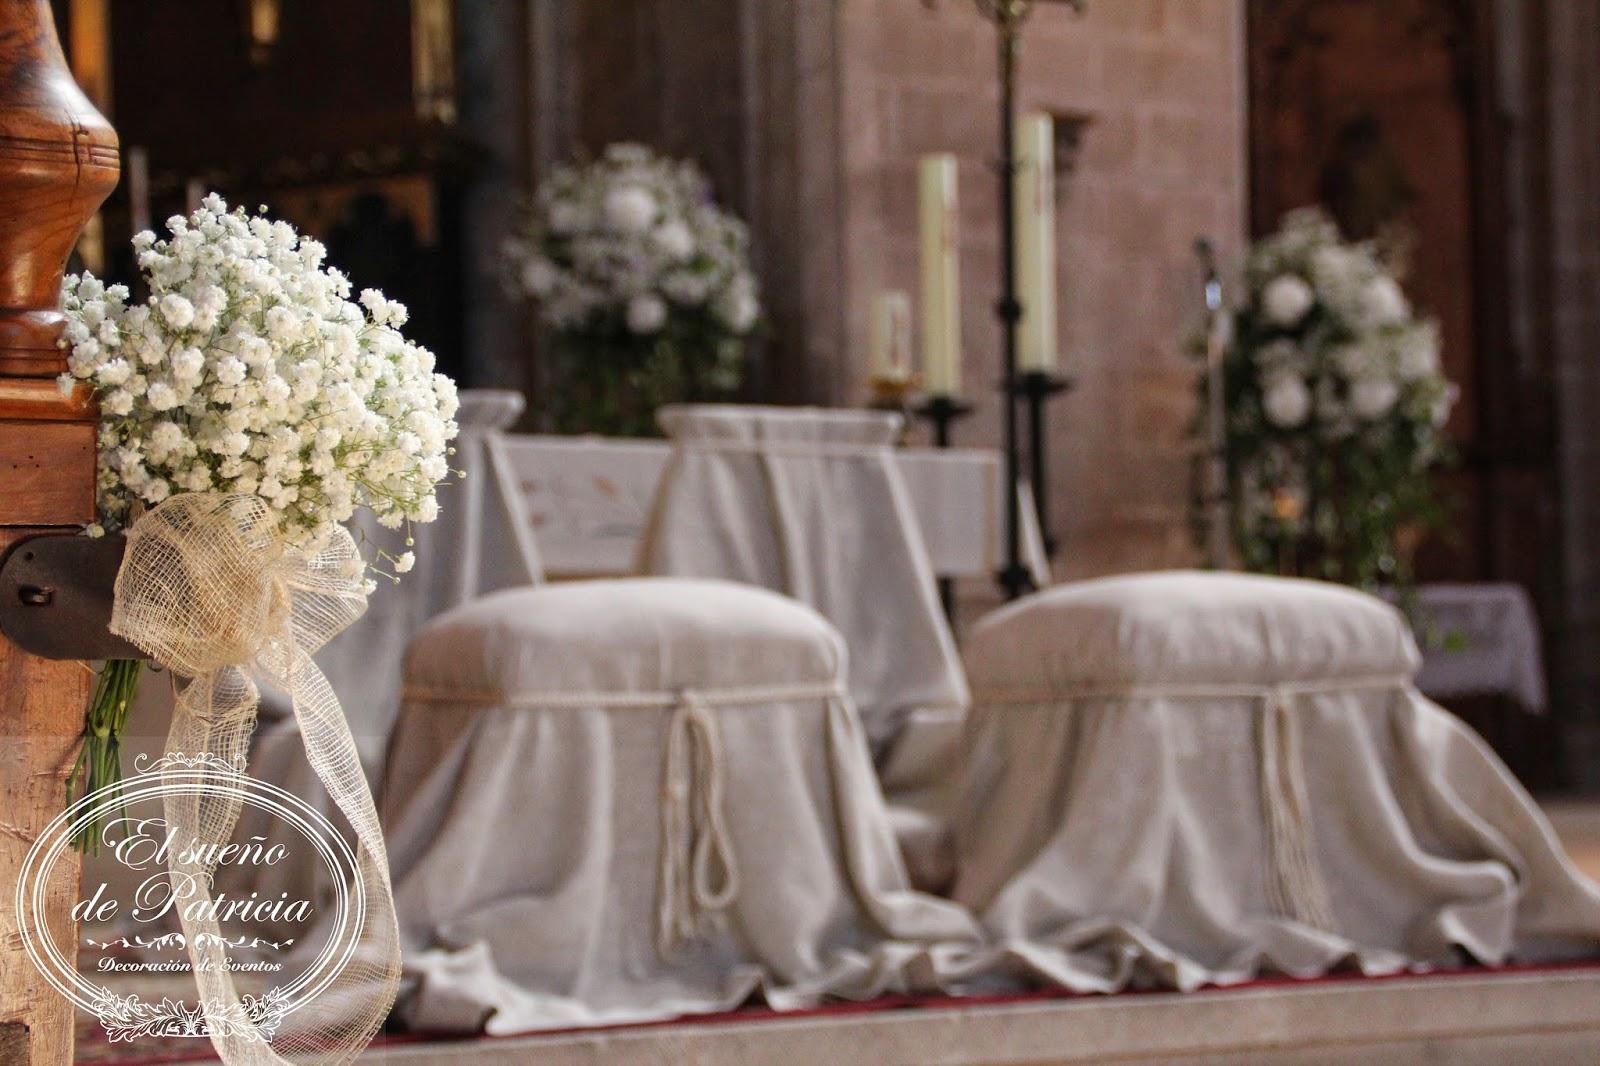 Decoracion iglesia boda rustica for Sillas para novios en la iglesia